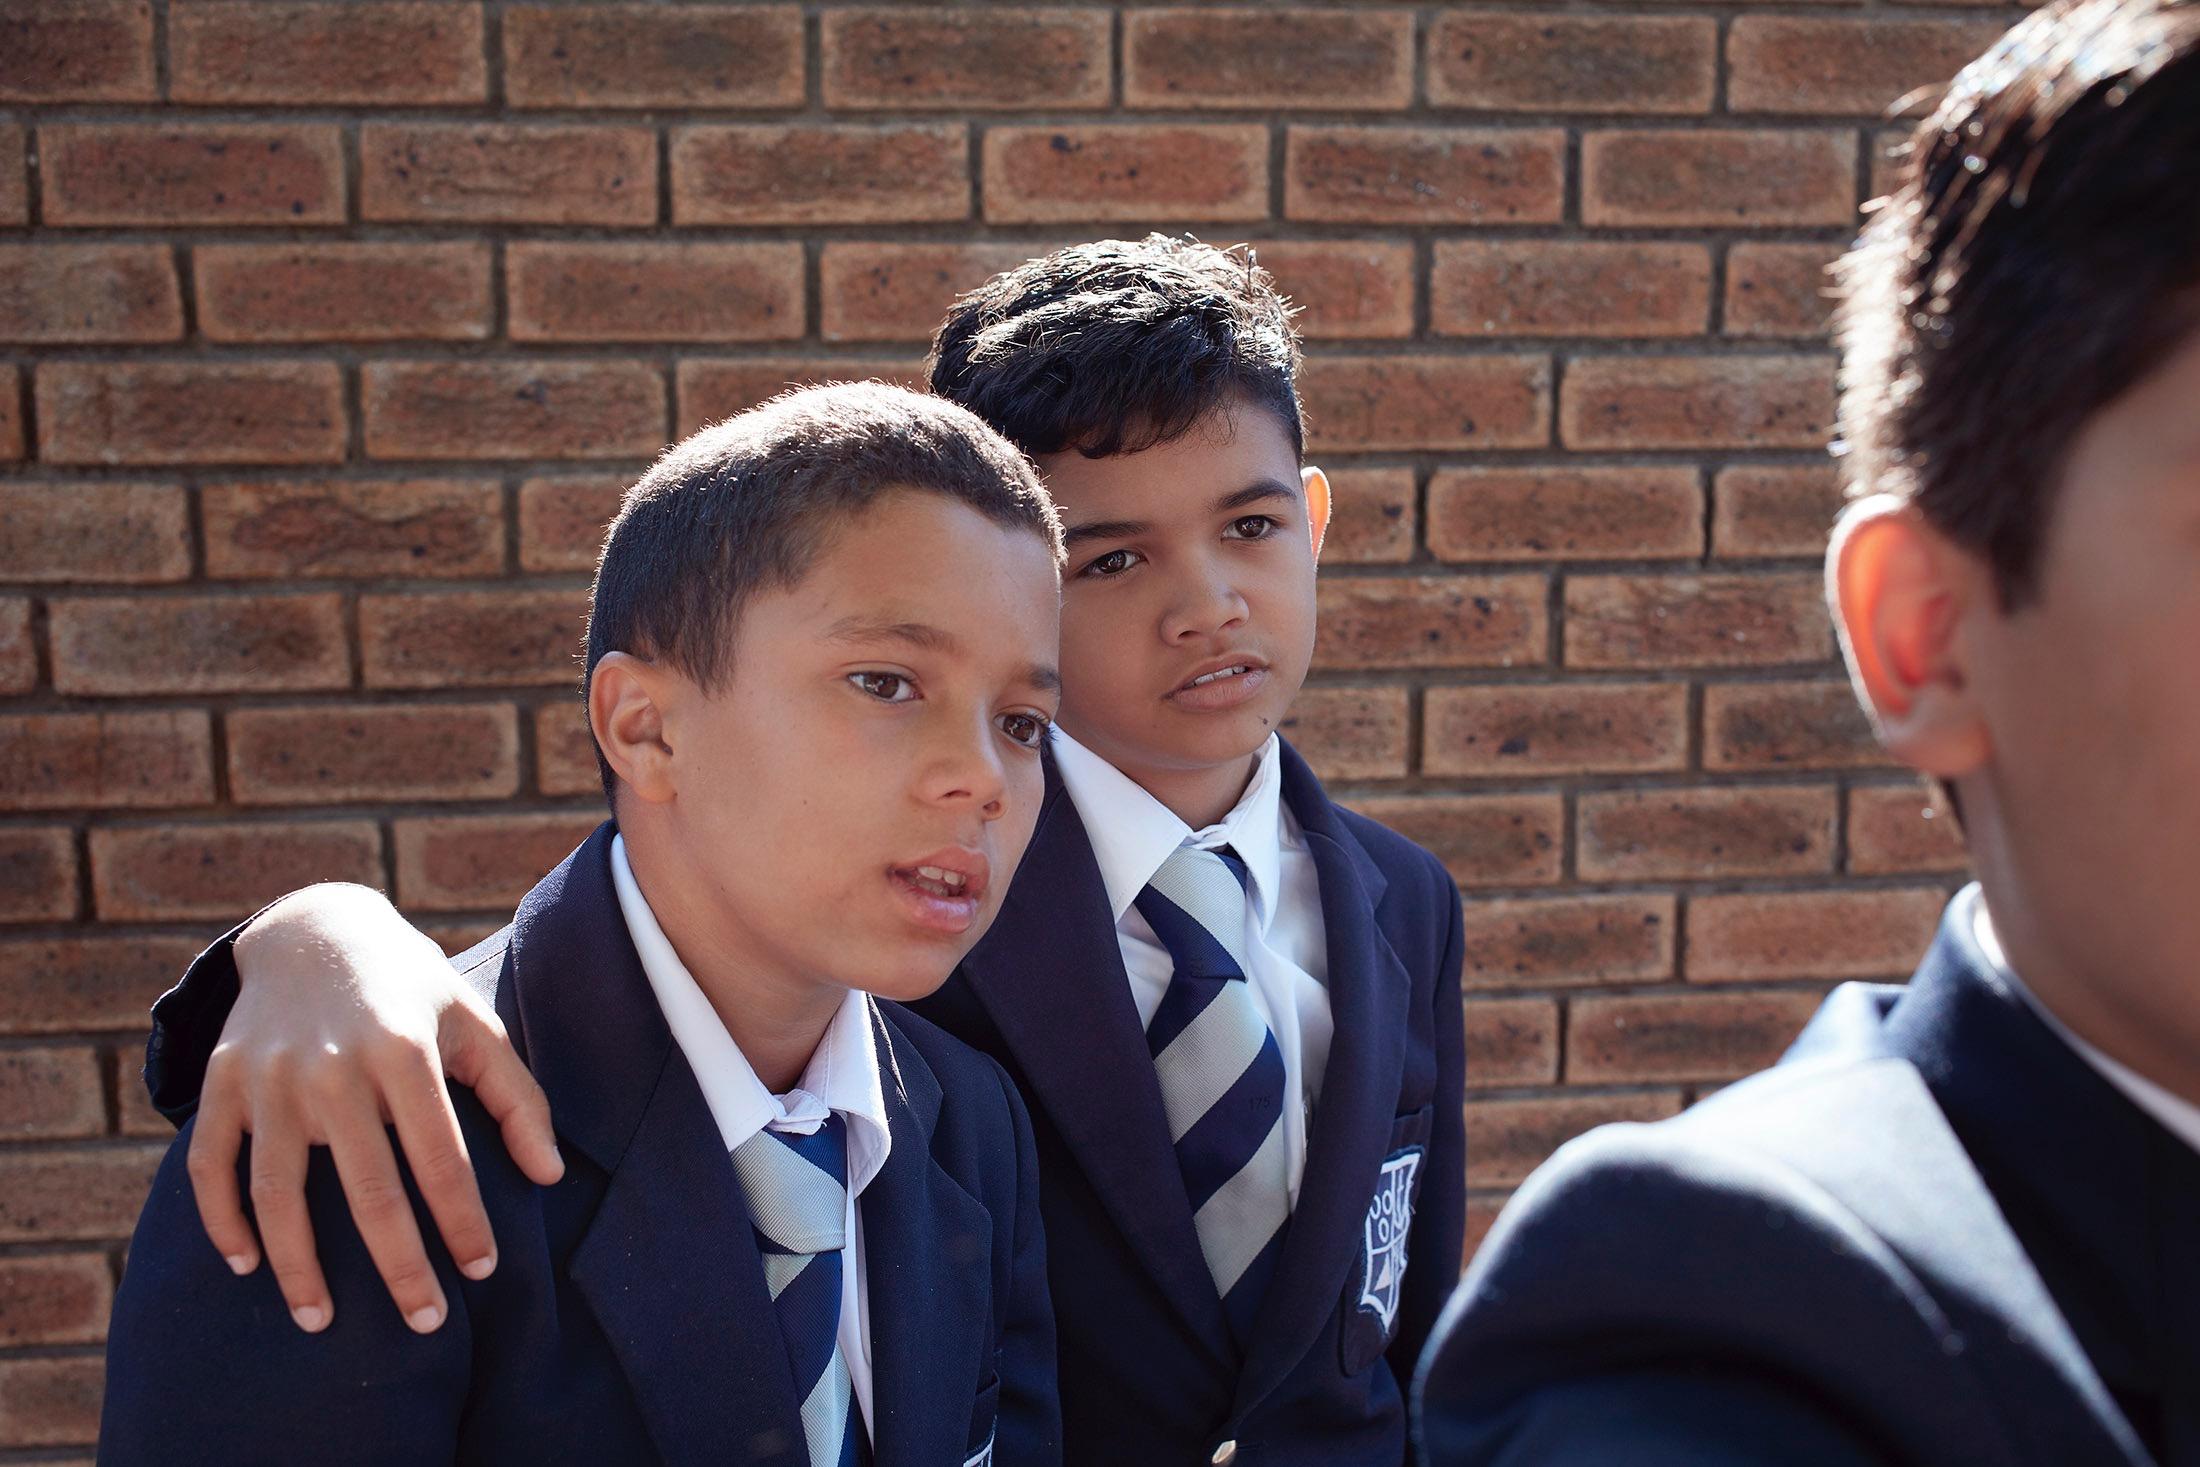 photo photography photographer school uniform education boy boys friends wall bricks